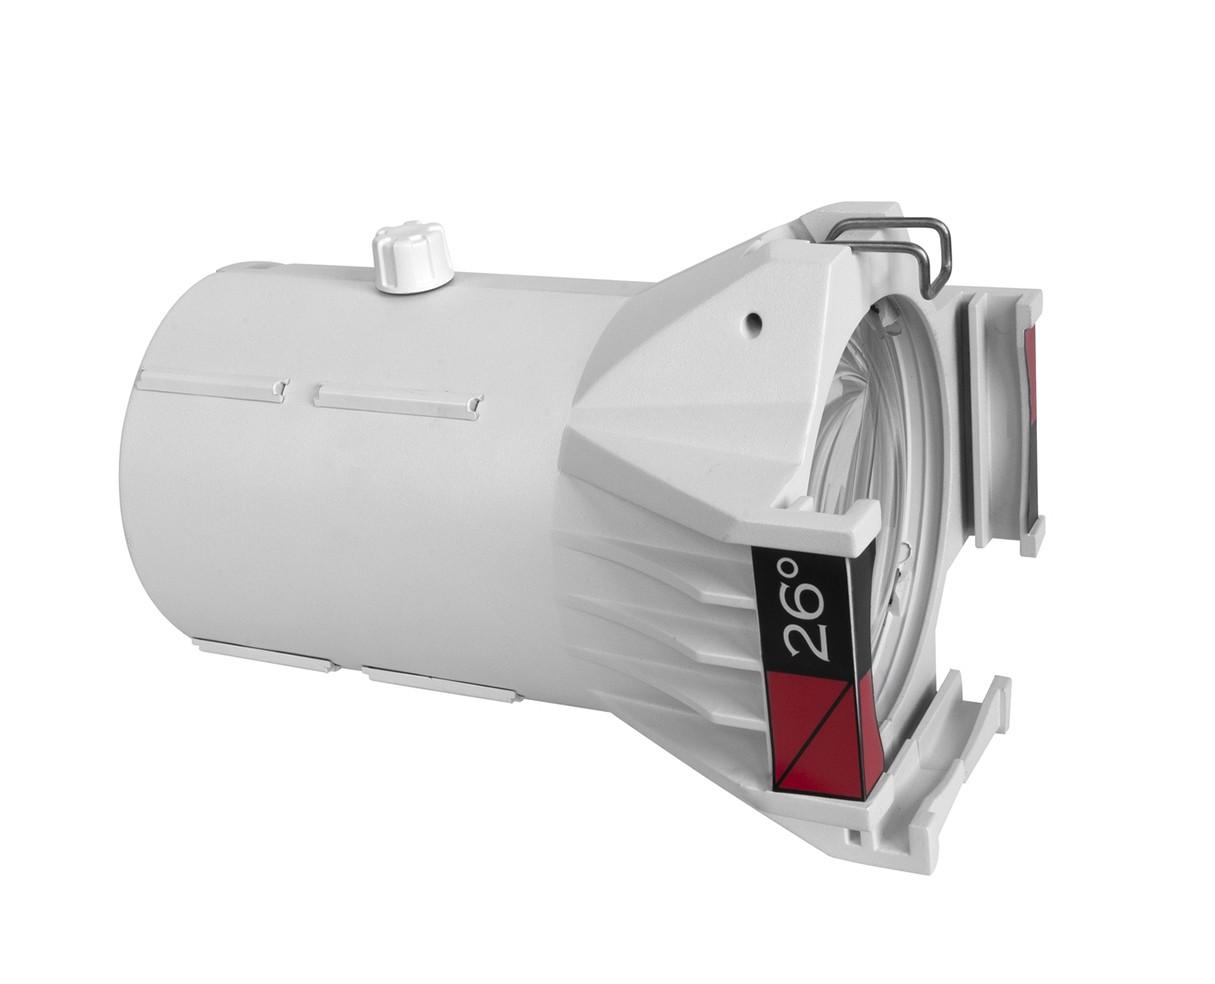 CHAUVET Professional 26 Degree Ovation Ellipsoidal HD Lens Tube (White Housing)